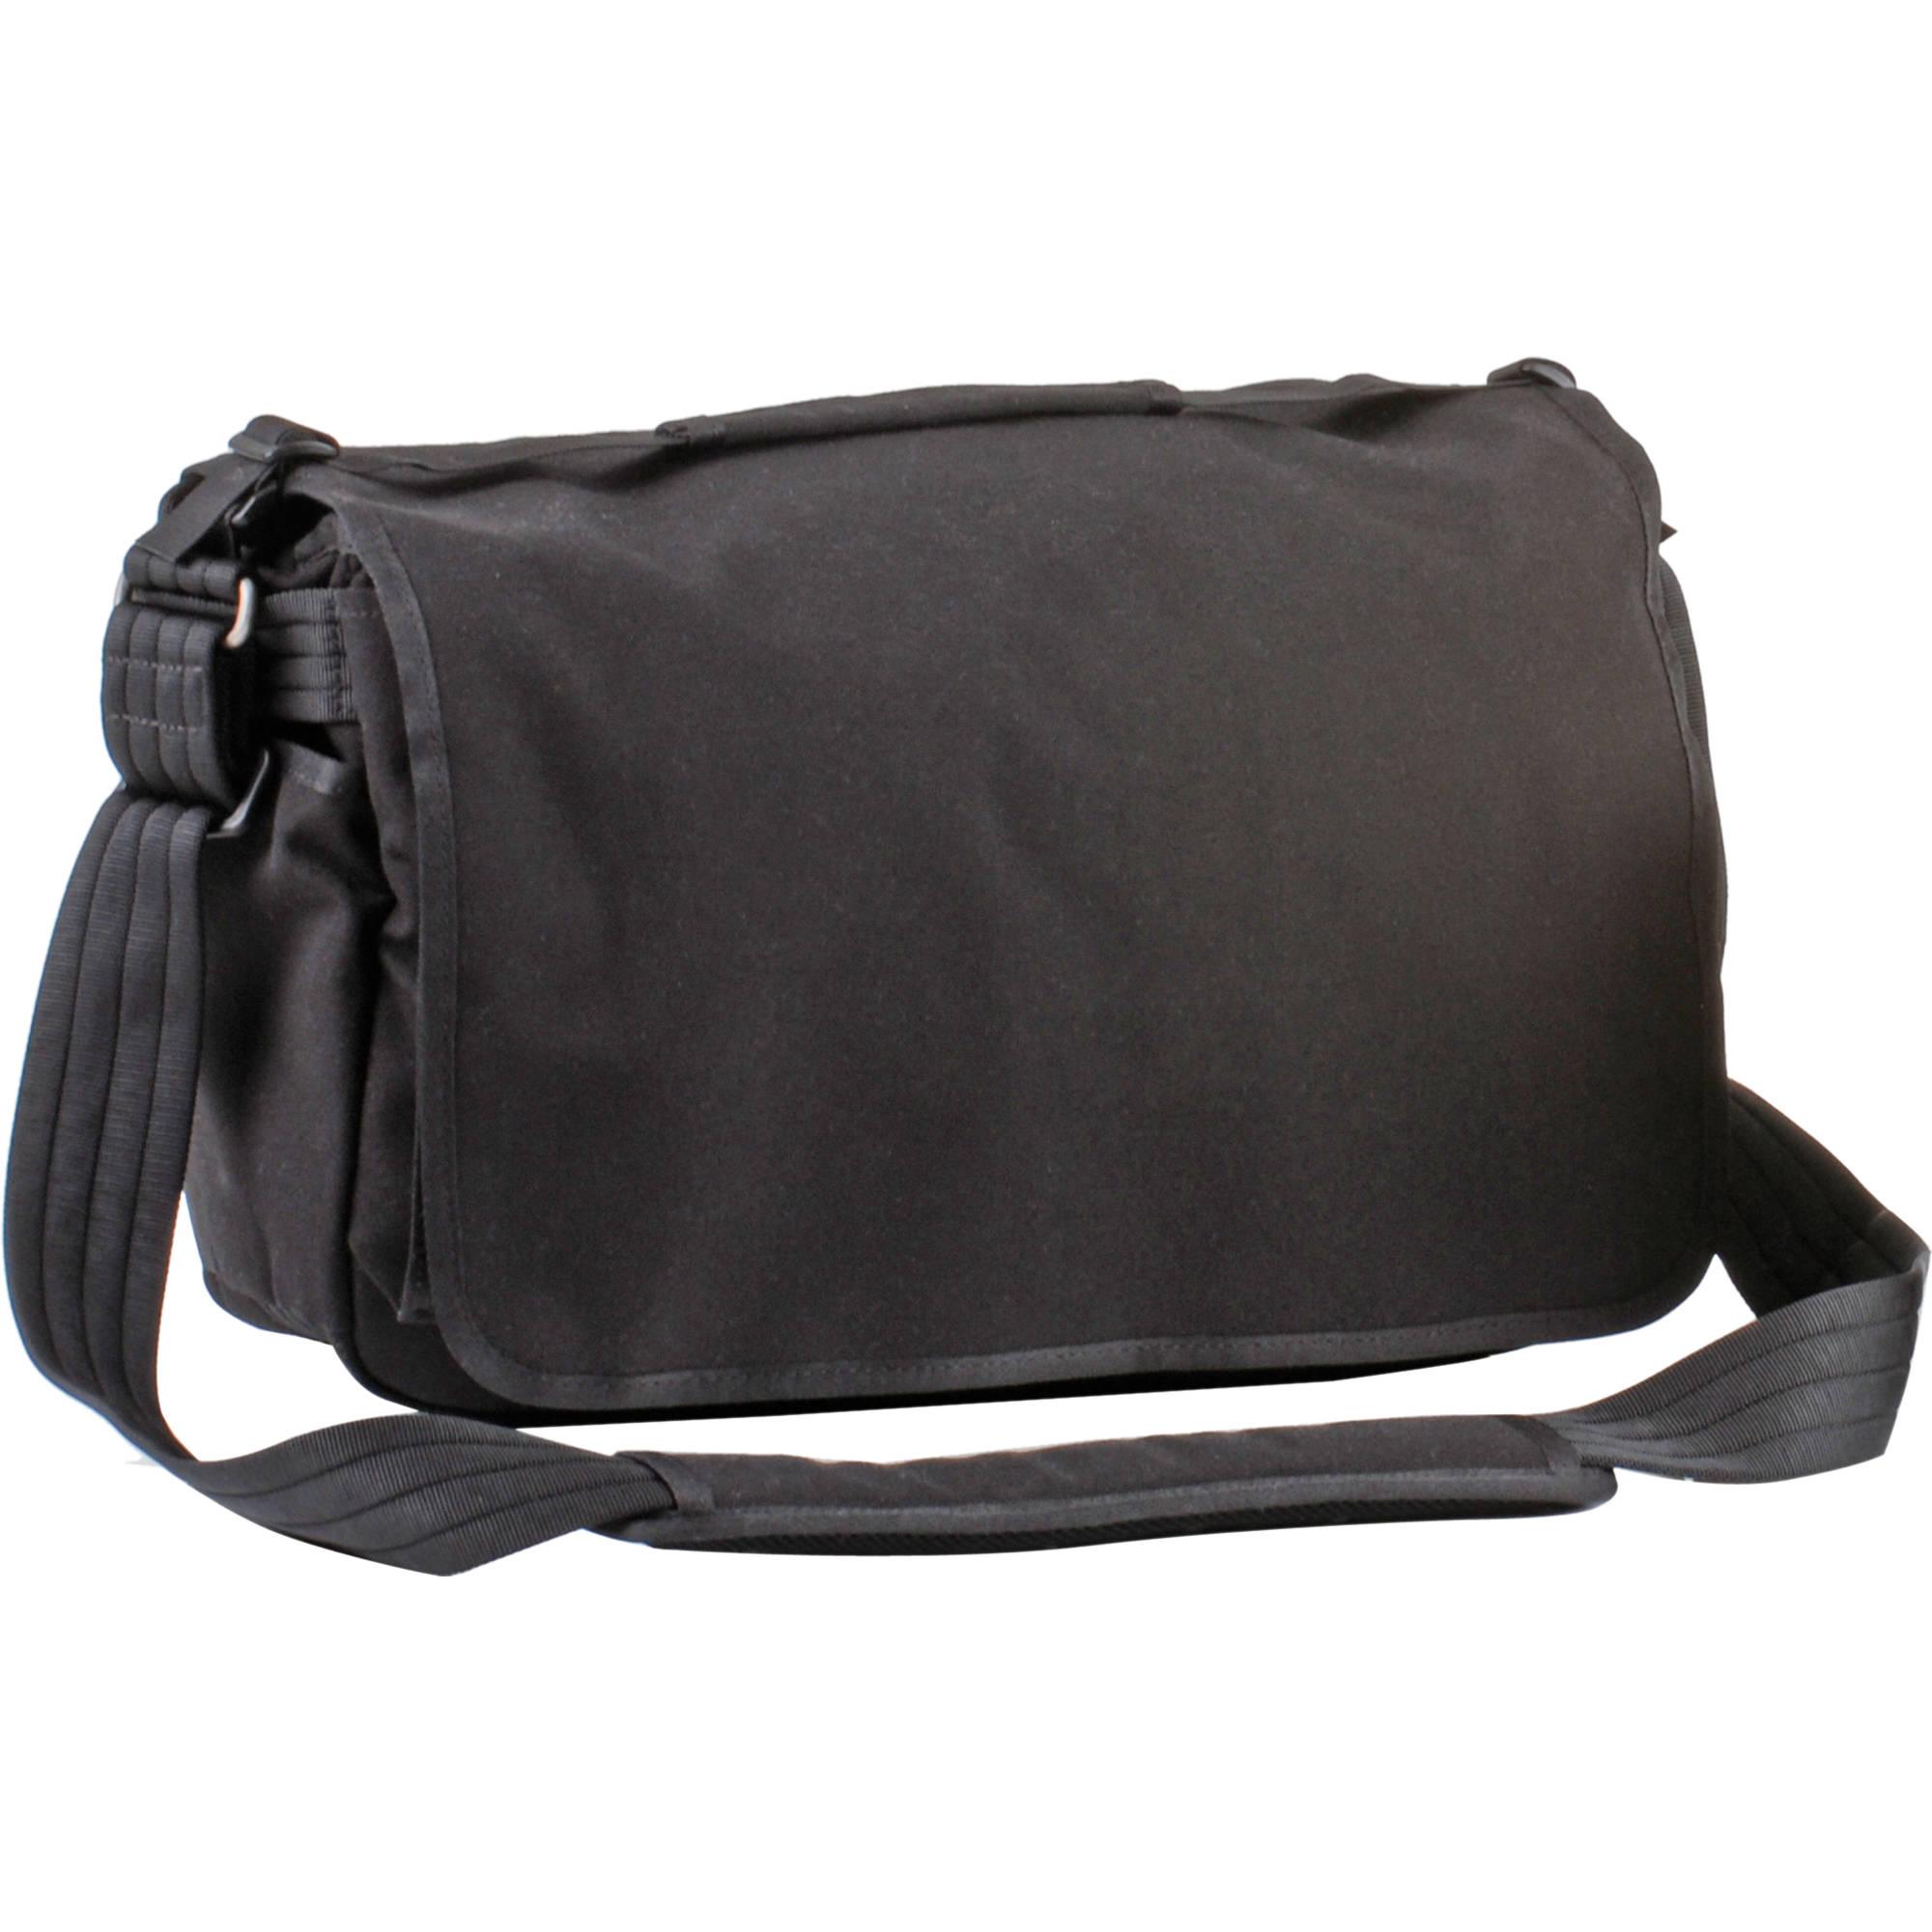 5330a6f789 Think Tank Photo Retrospective 30 Shoulder Bag (Black) 710770